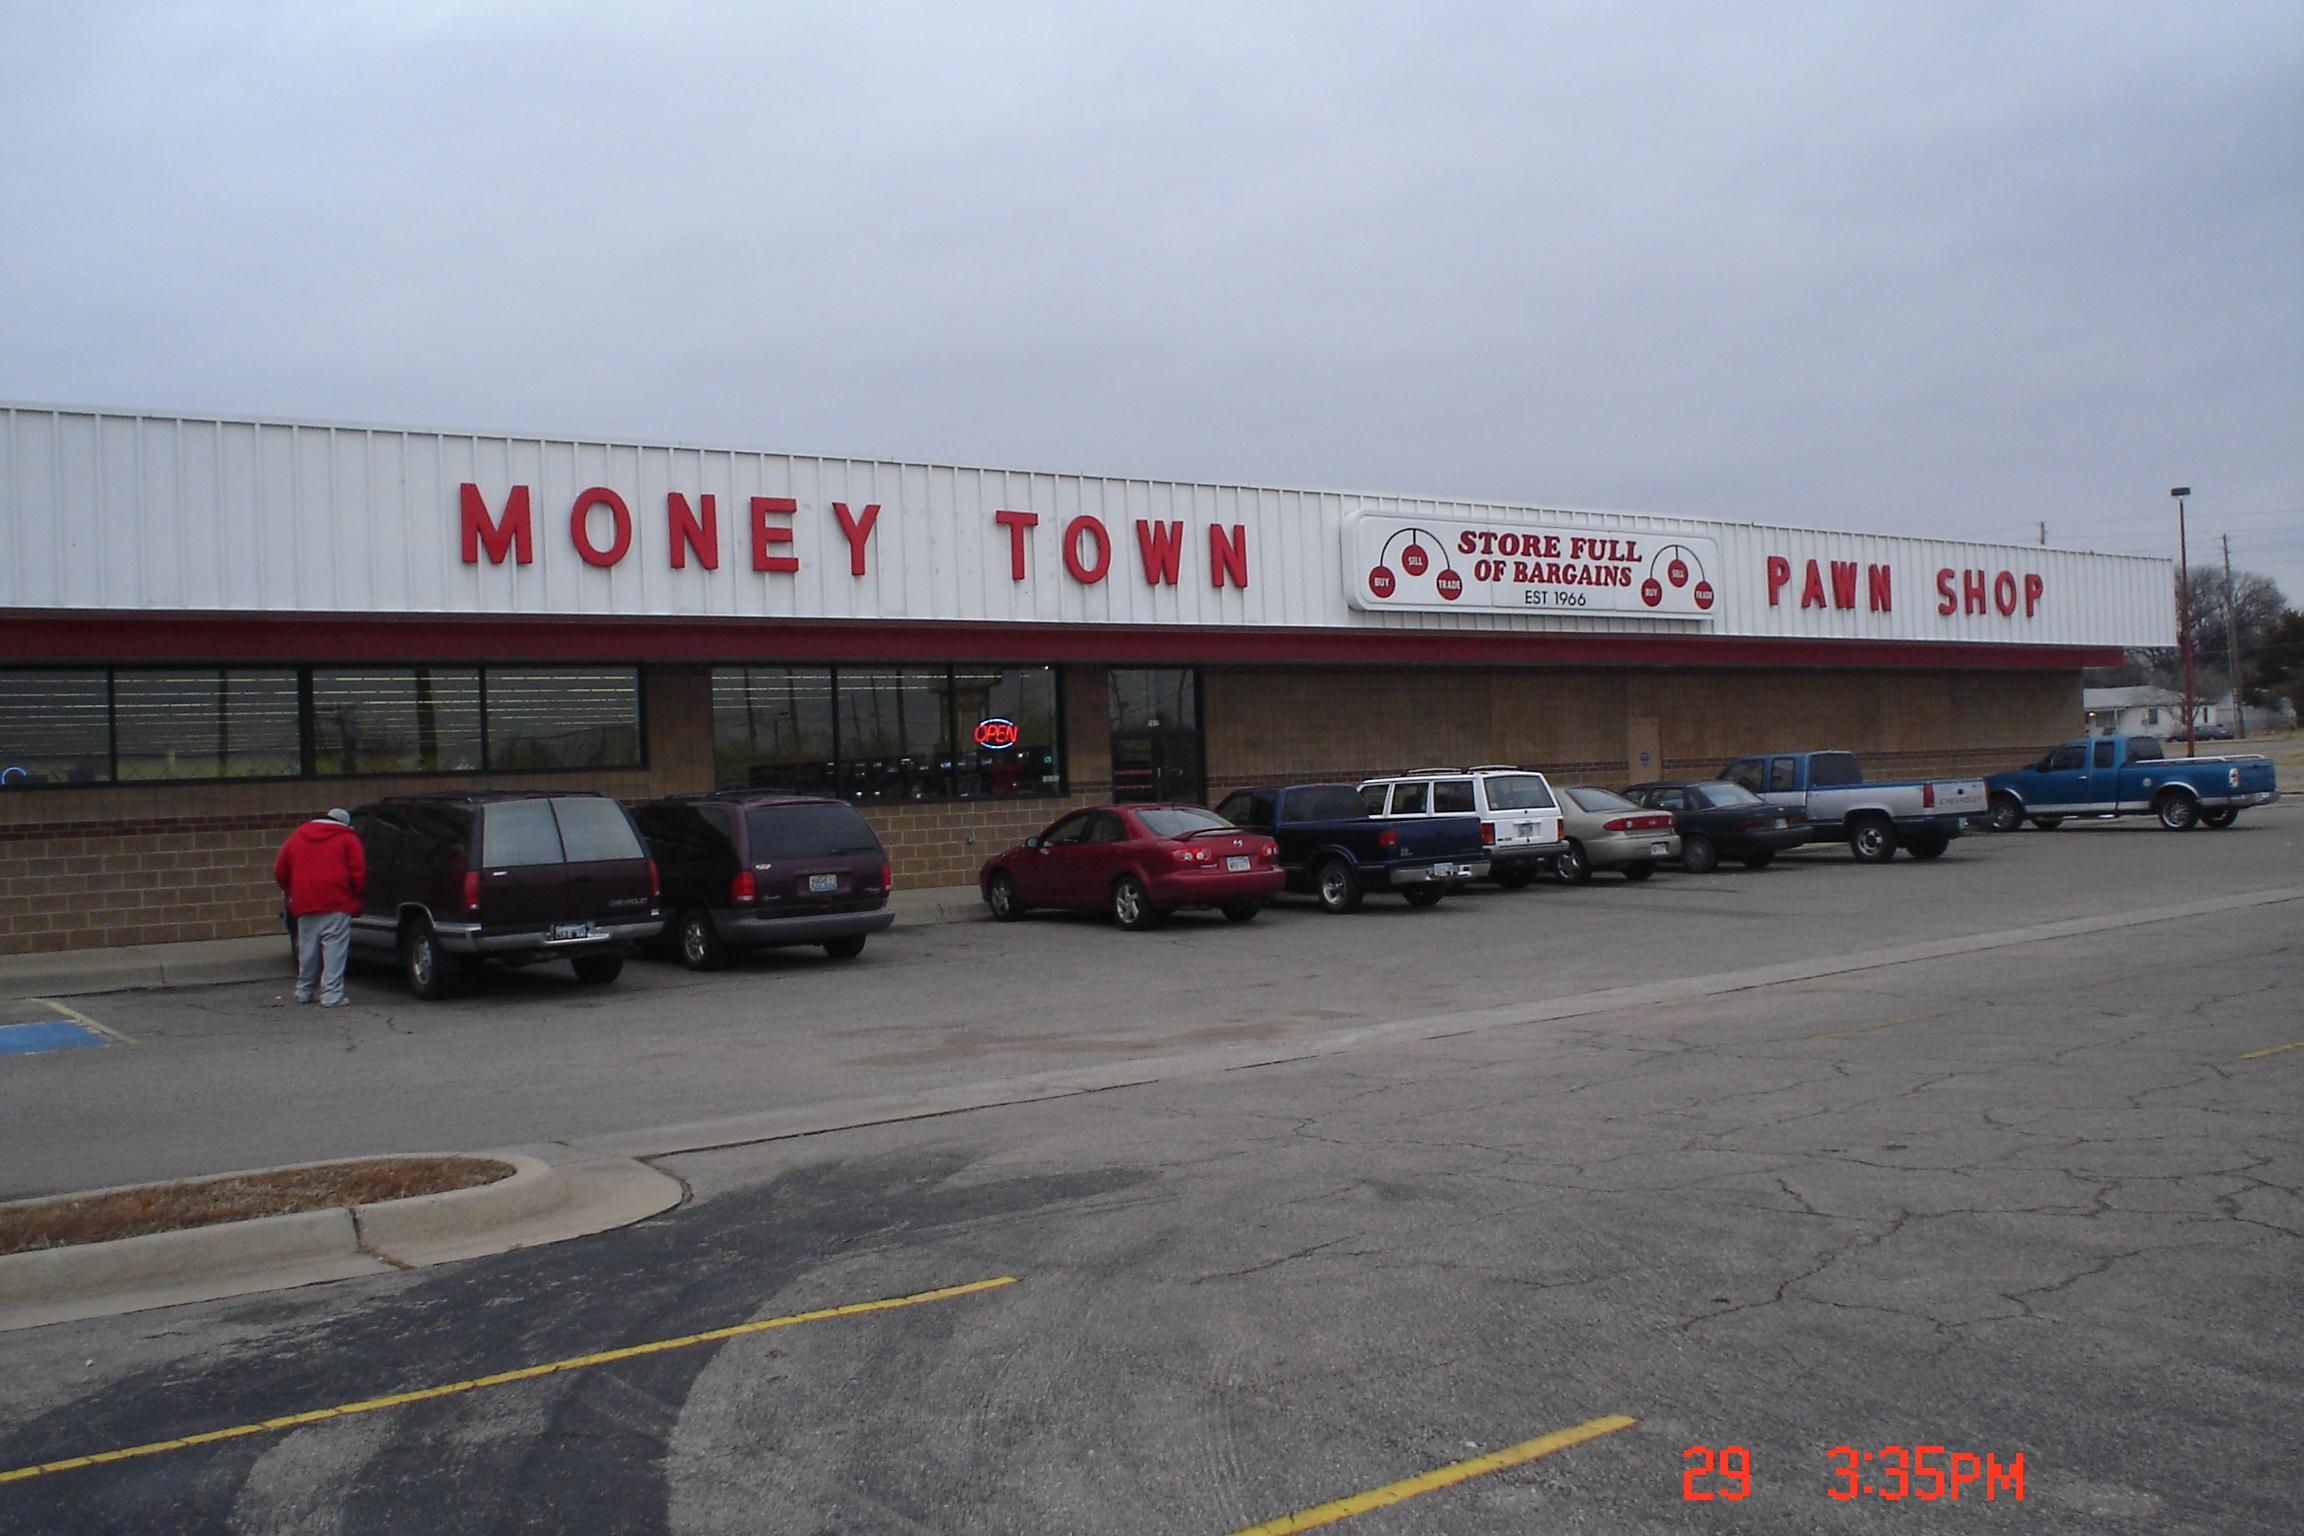 Money Town Pawn Shop